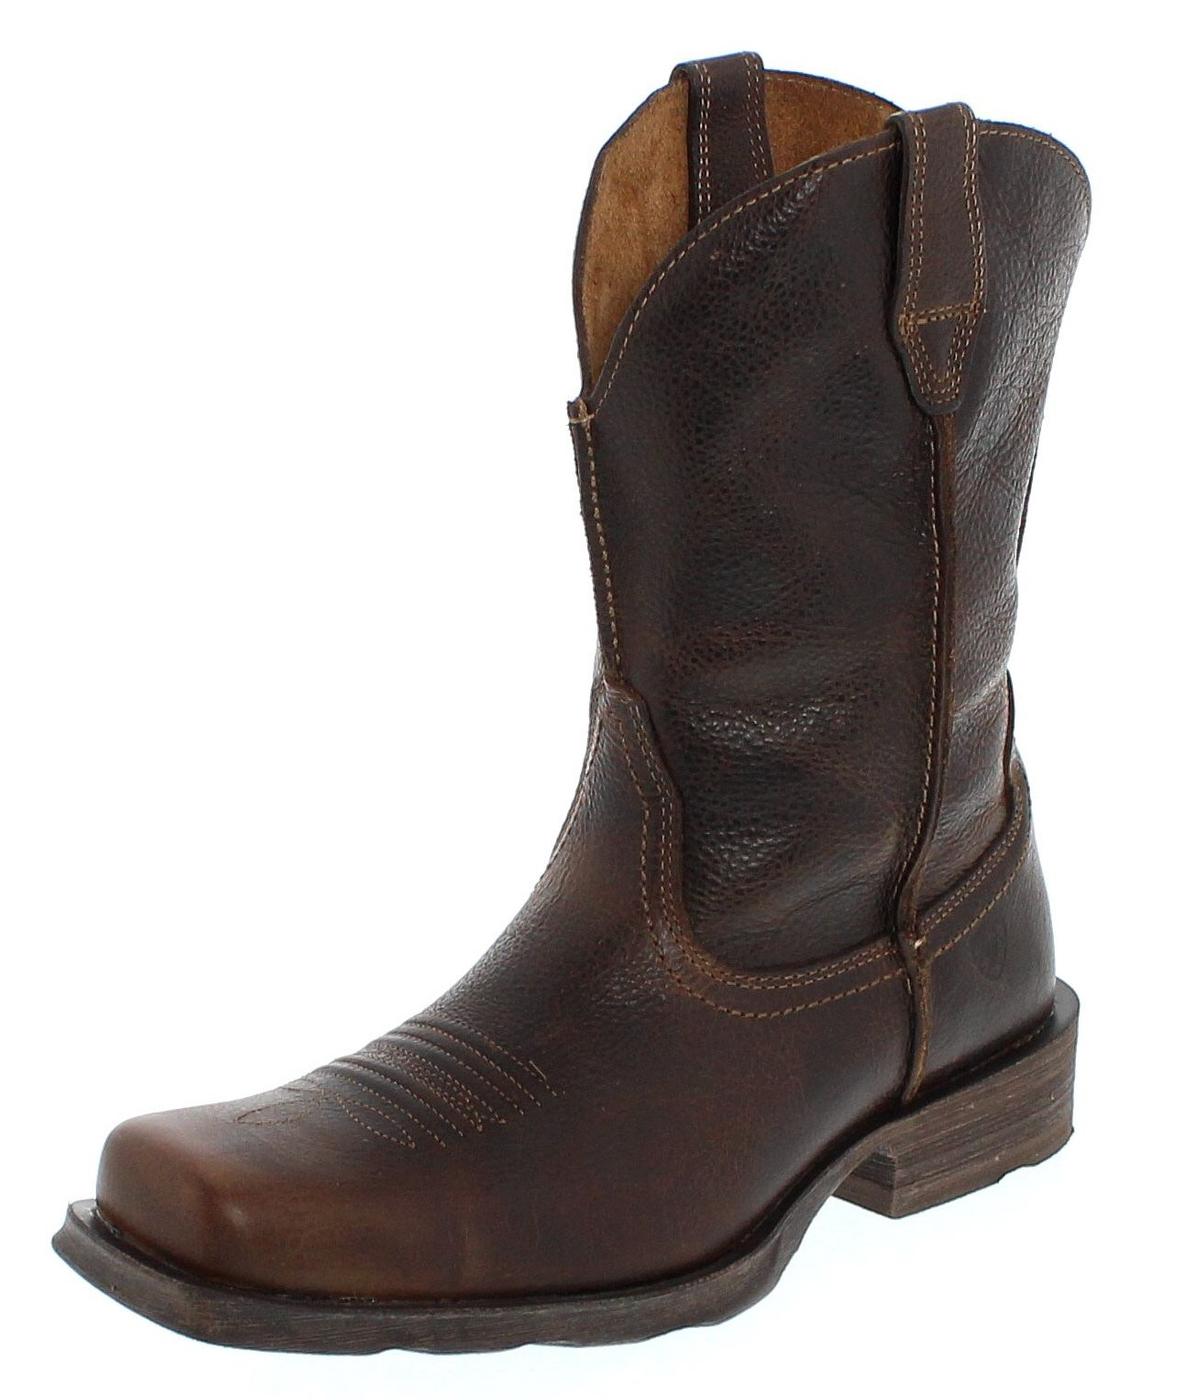 Ariat 15307 D RAMBLER Wicker Western riding boot - dark brown